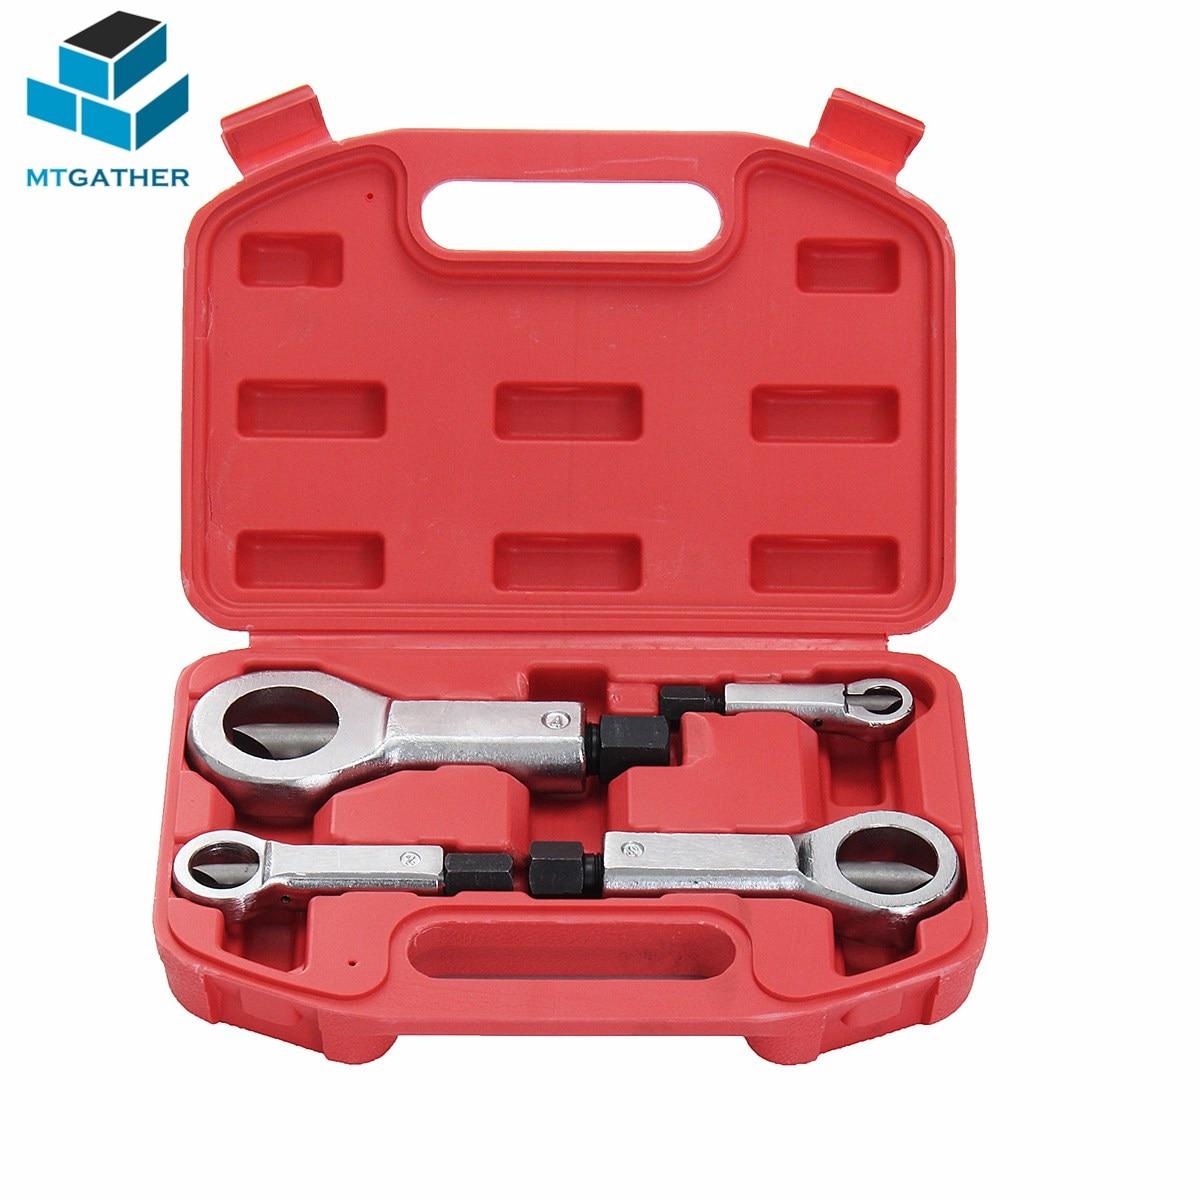 MTGATHER 4 Pz Nuovo Nut Splitter Kit Cracker Remover Extractor Strumento Set Lama In Acciaio Gorged Grip Remover Corroso Split Strumento 9-36mm